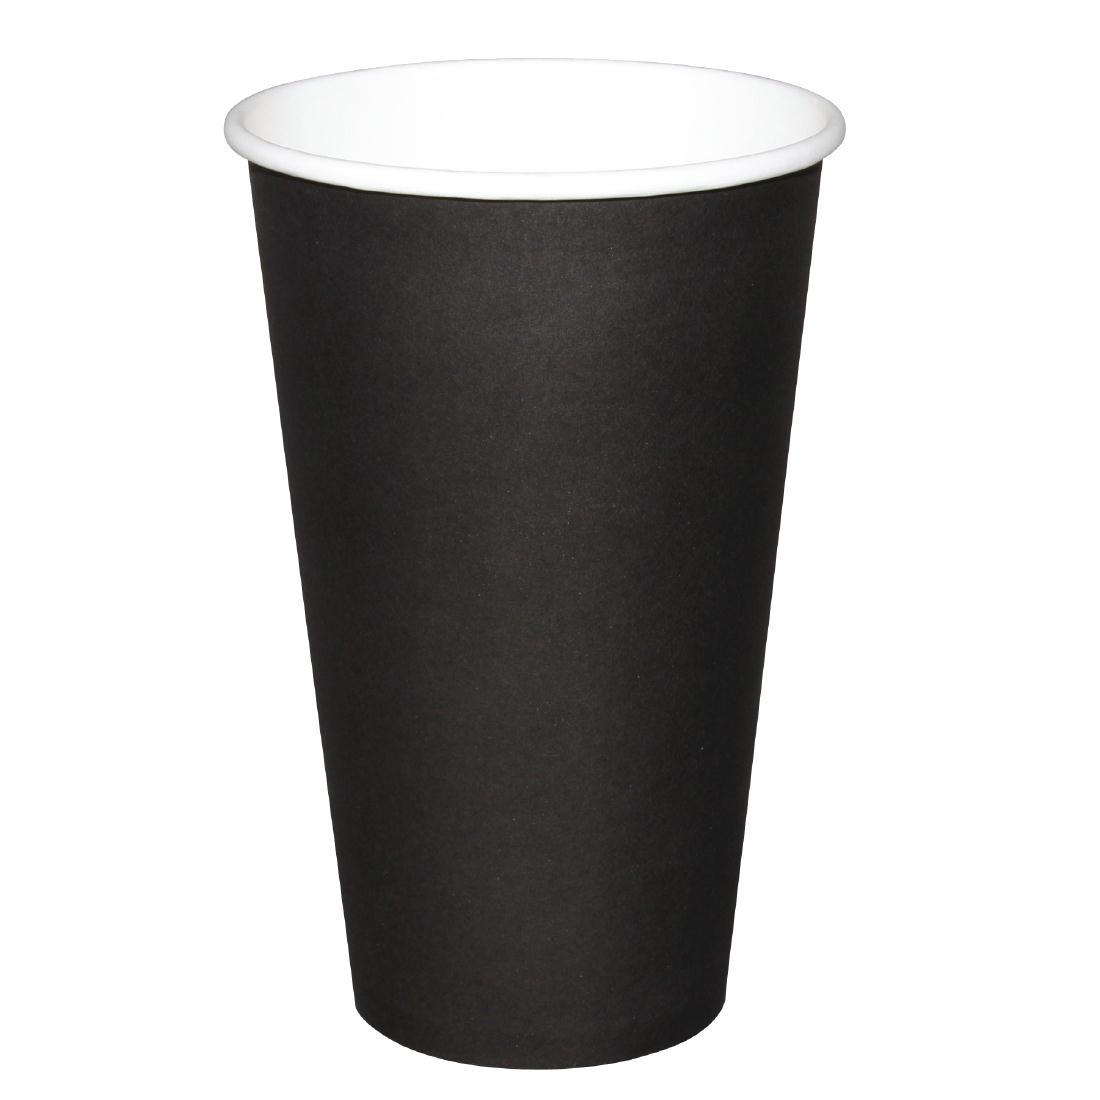 Gobelets jetables boissons chaudes Fiesta noirs 450ml x1000